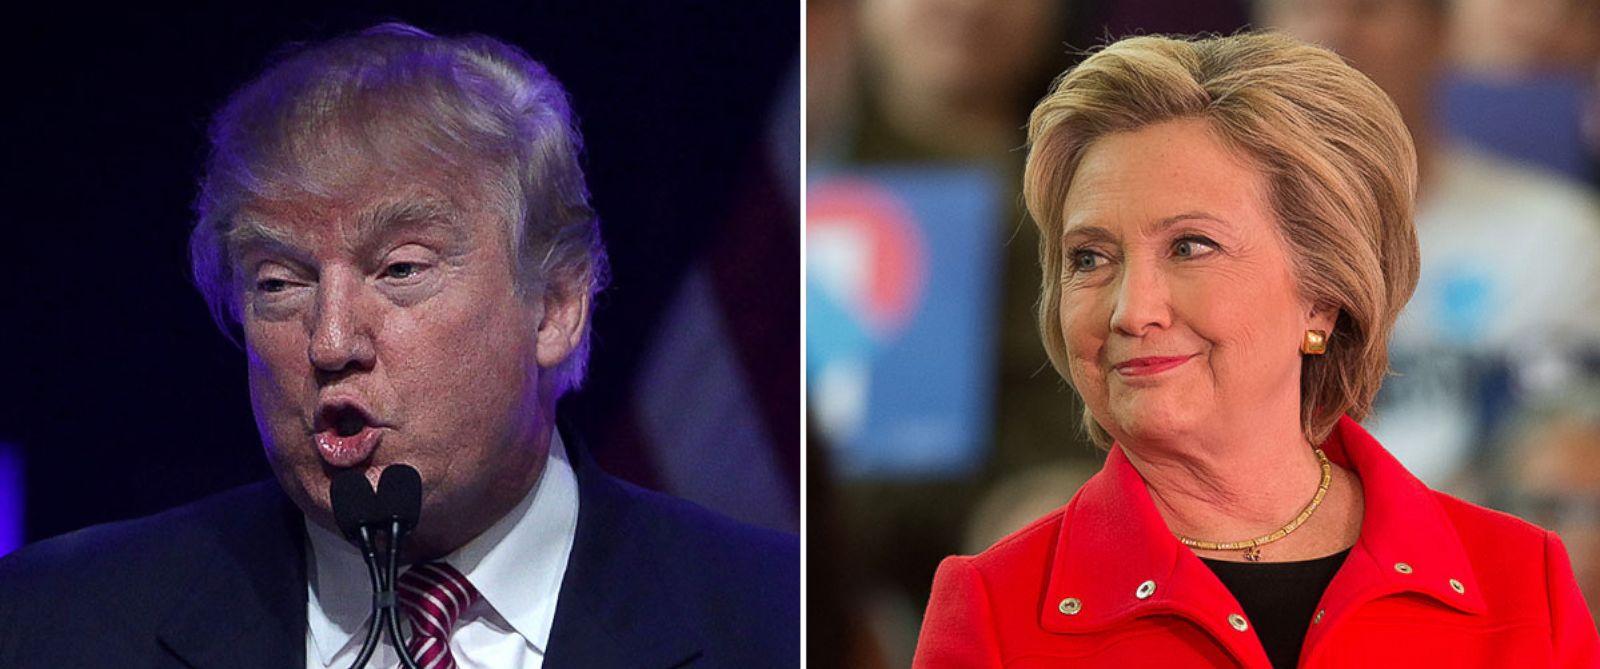 PHOTO: Republican presidential candidate Donald Trump and Democratic presidential candidate Hillary Clinton.